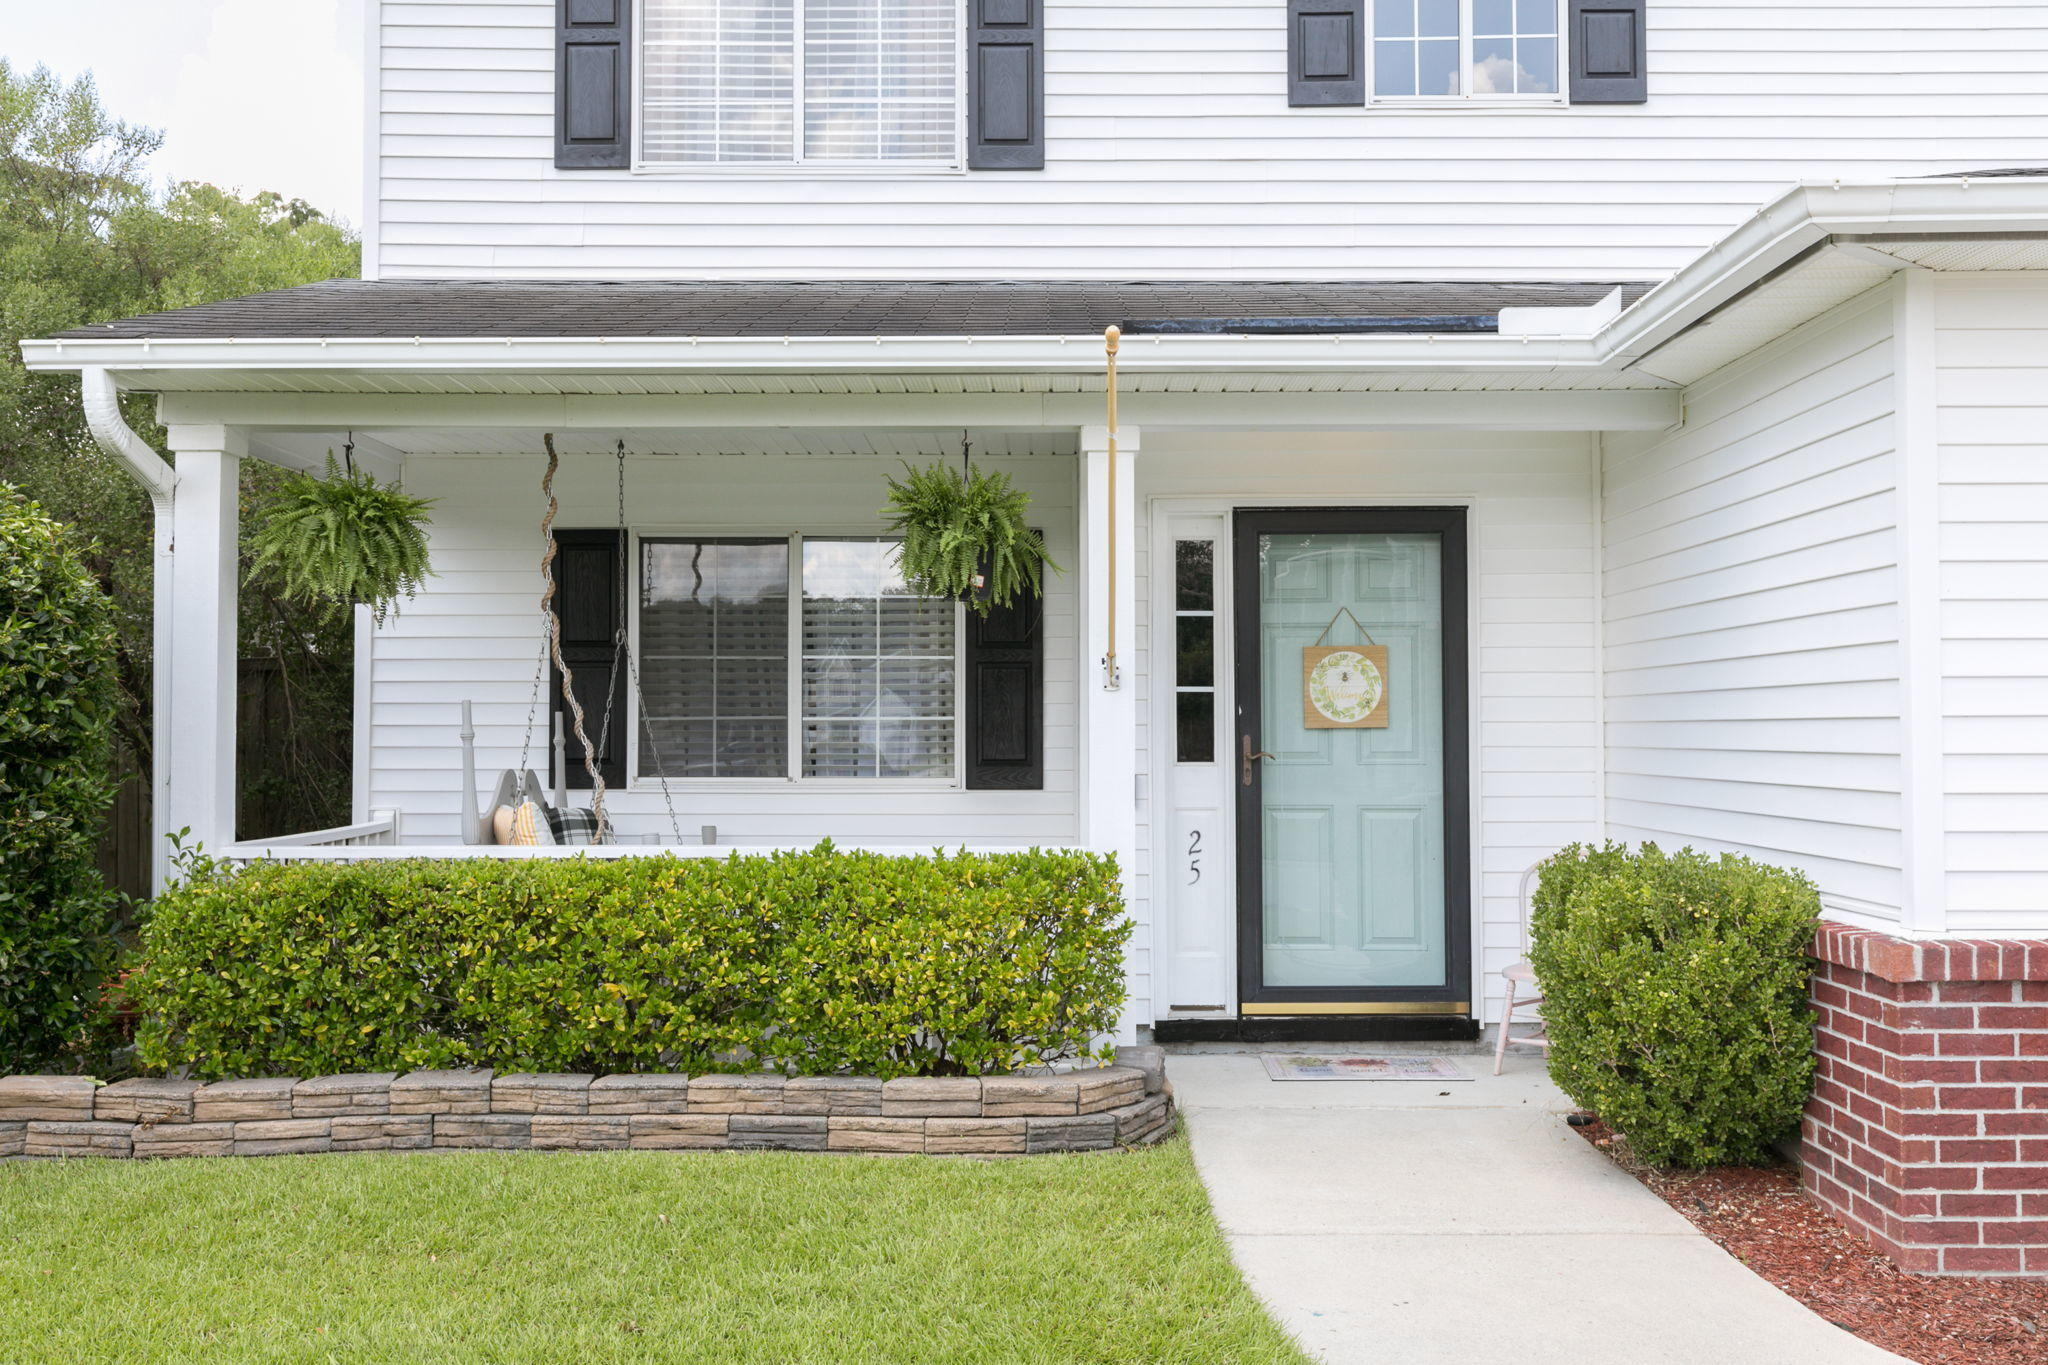 Bridges of Summerville Homes For Sale - 25 Regency Oaks, Summerville, SC - 28